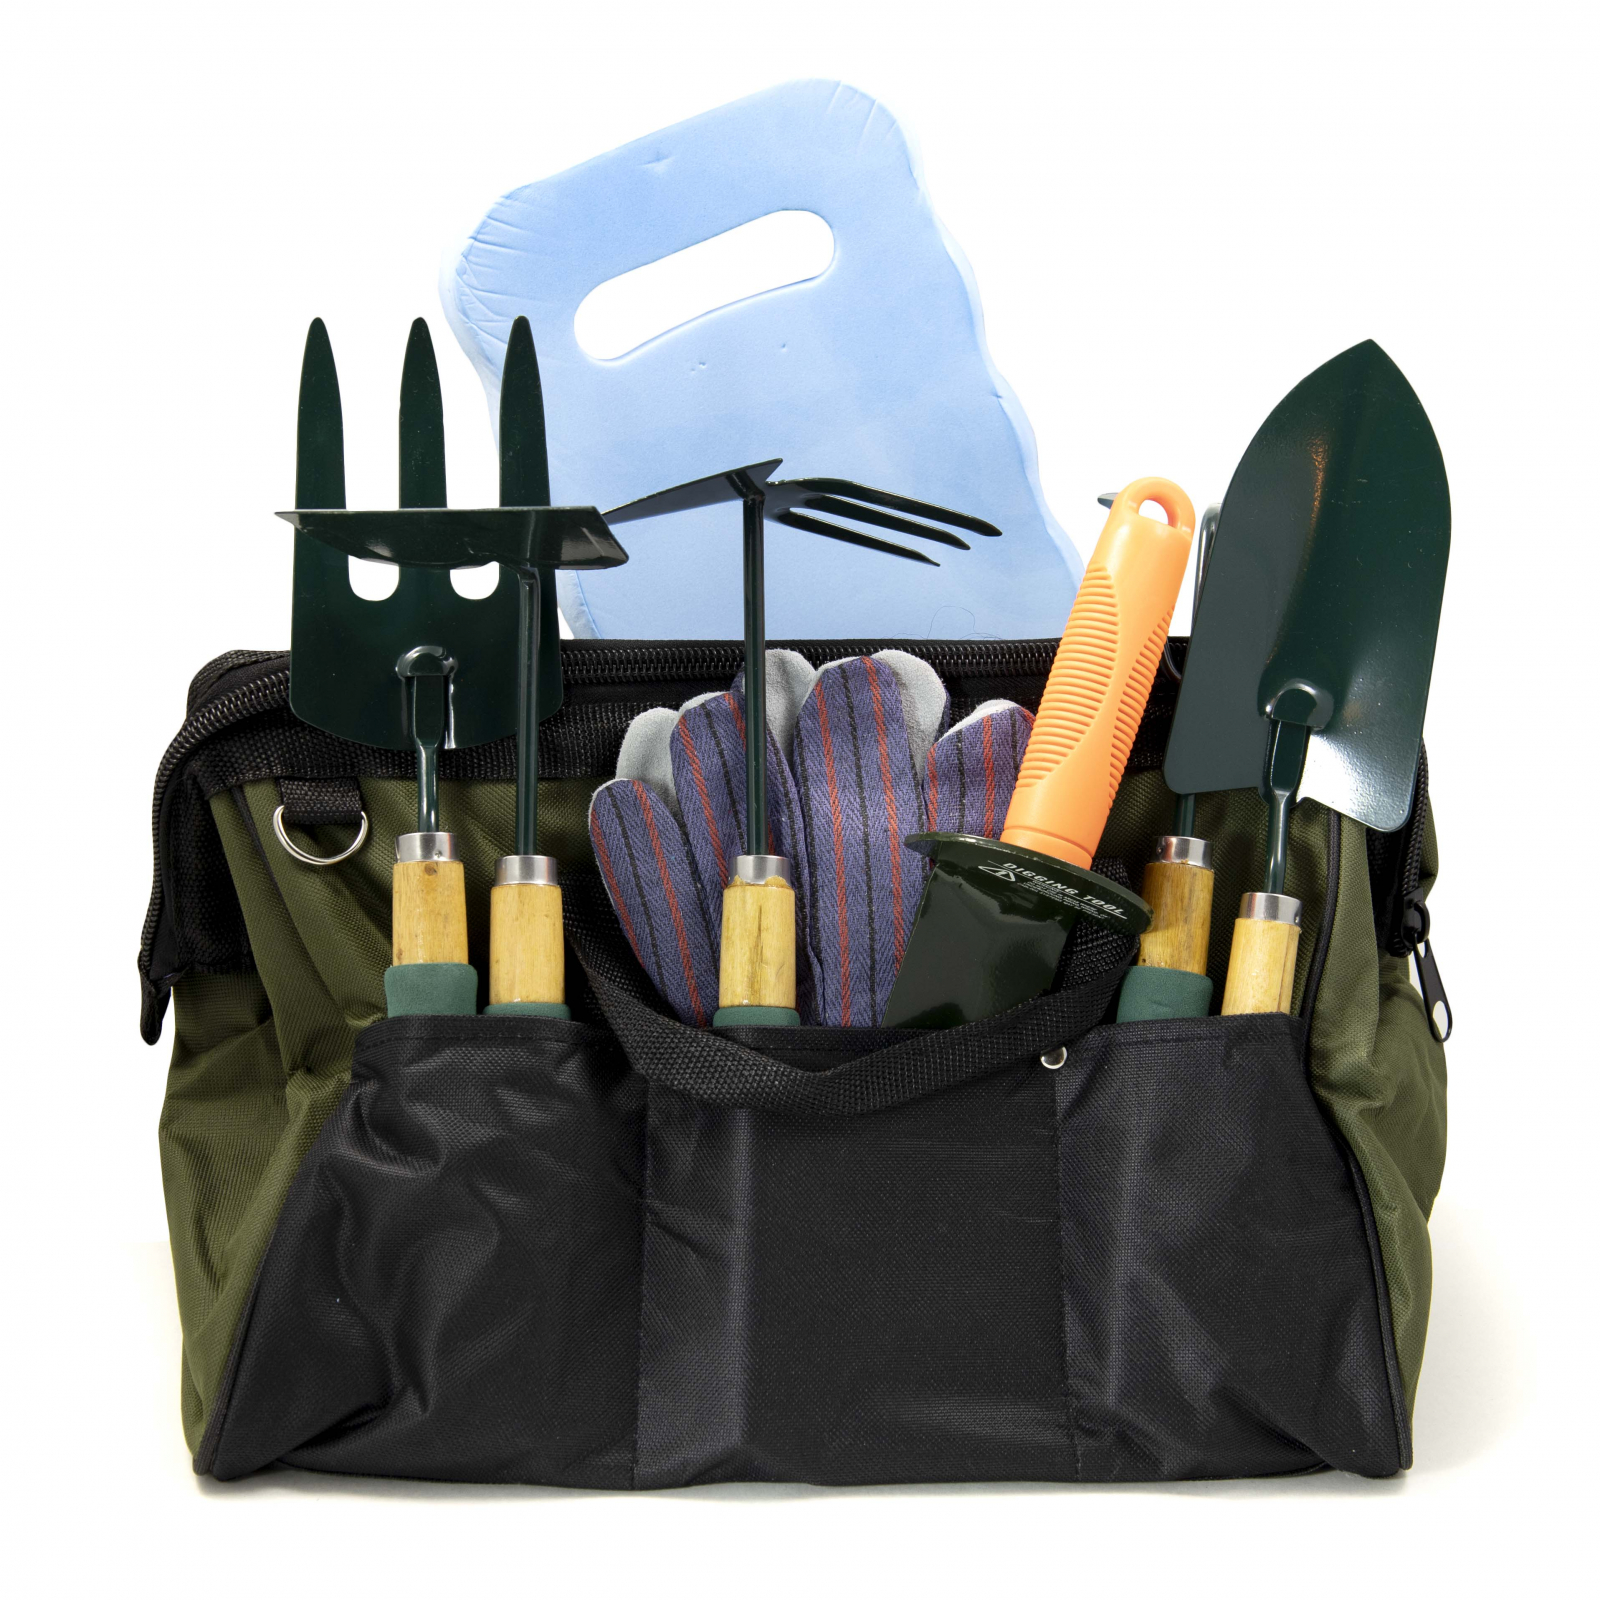 ToolTreaux Garden Tools Set with Fork Hoe Rake Shovel Spade